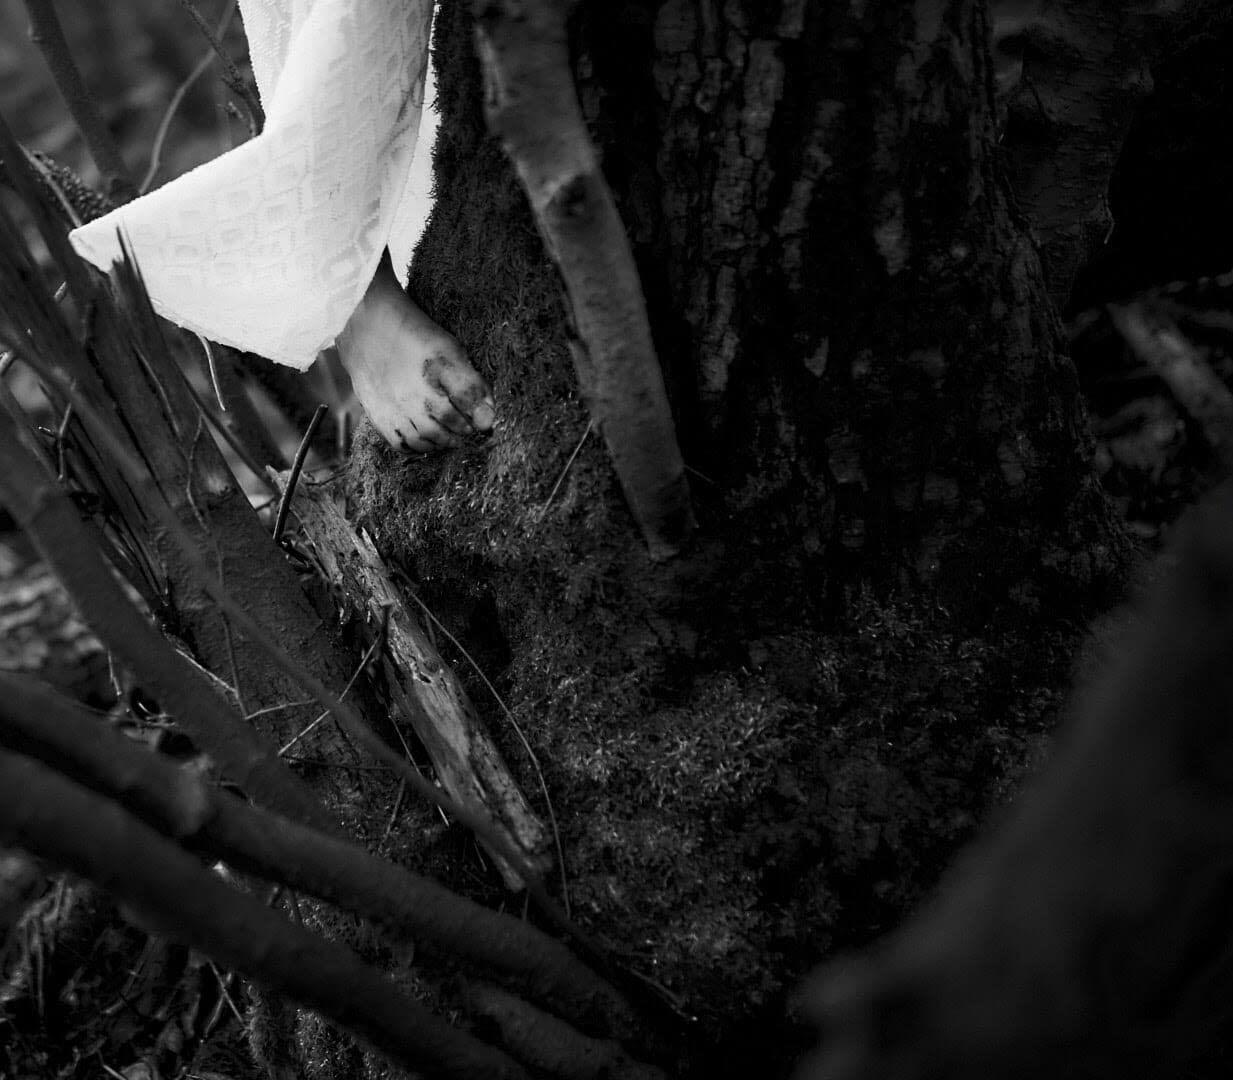 Fine-art Nude, Aktfotografie | Lost in the Swamp 4